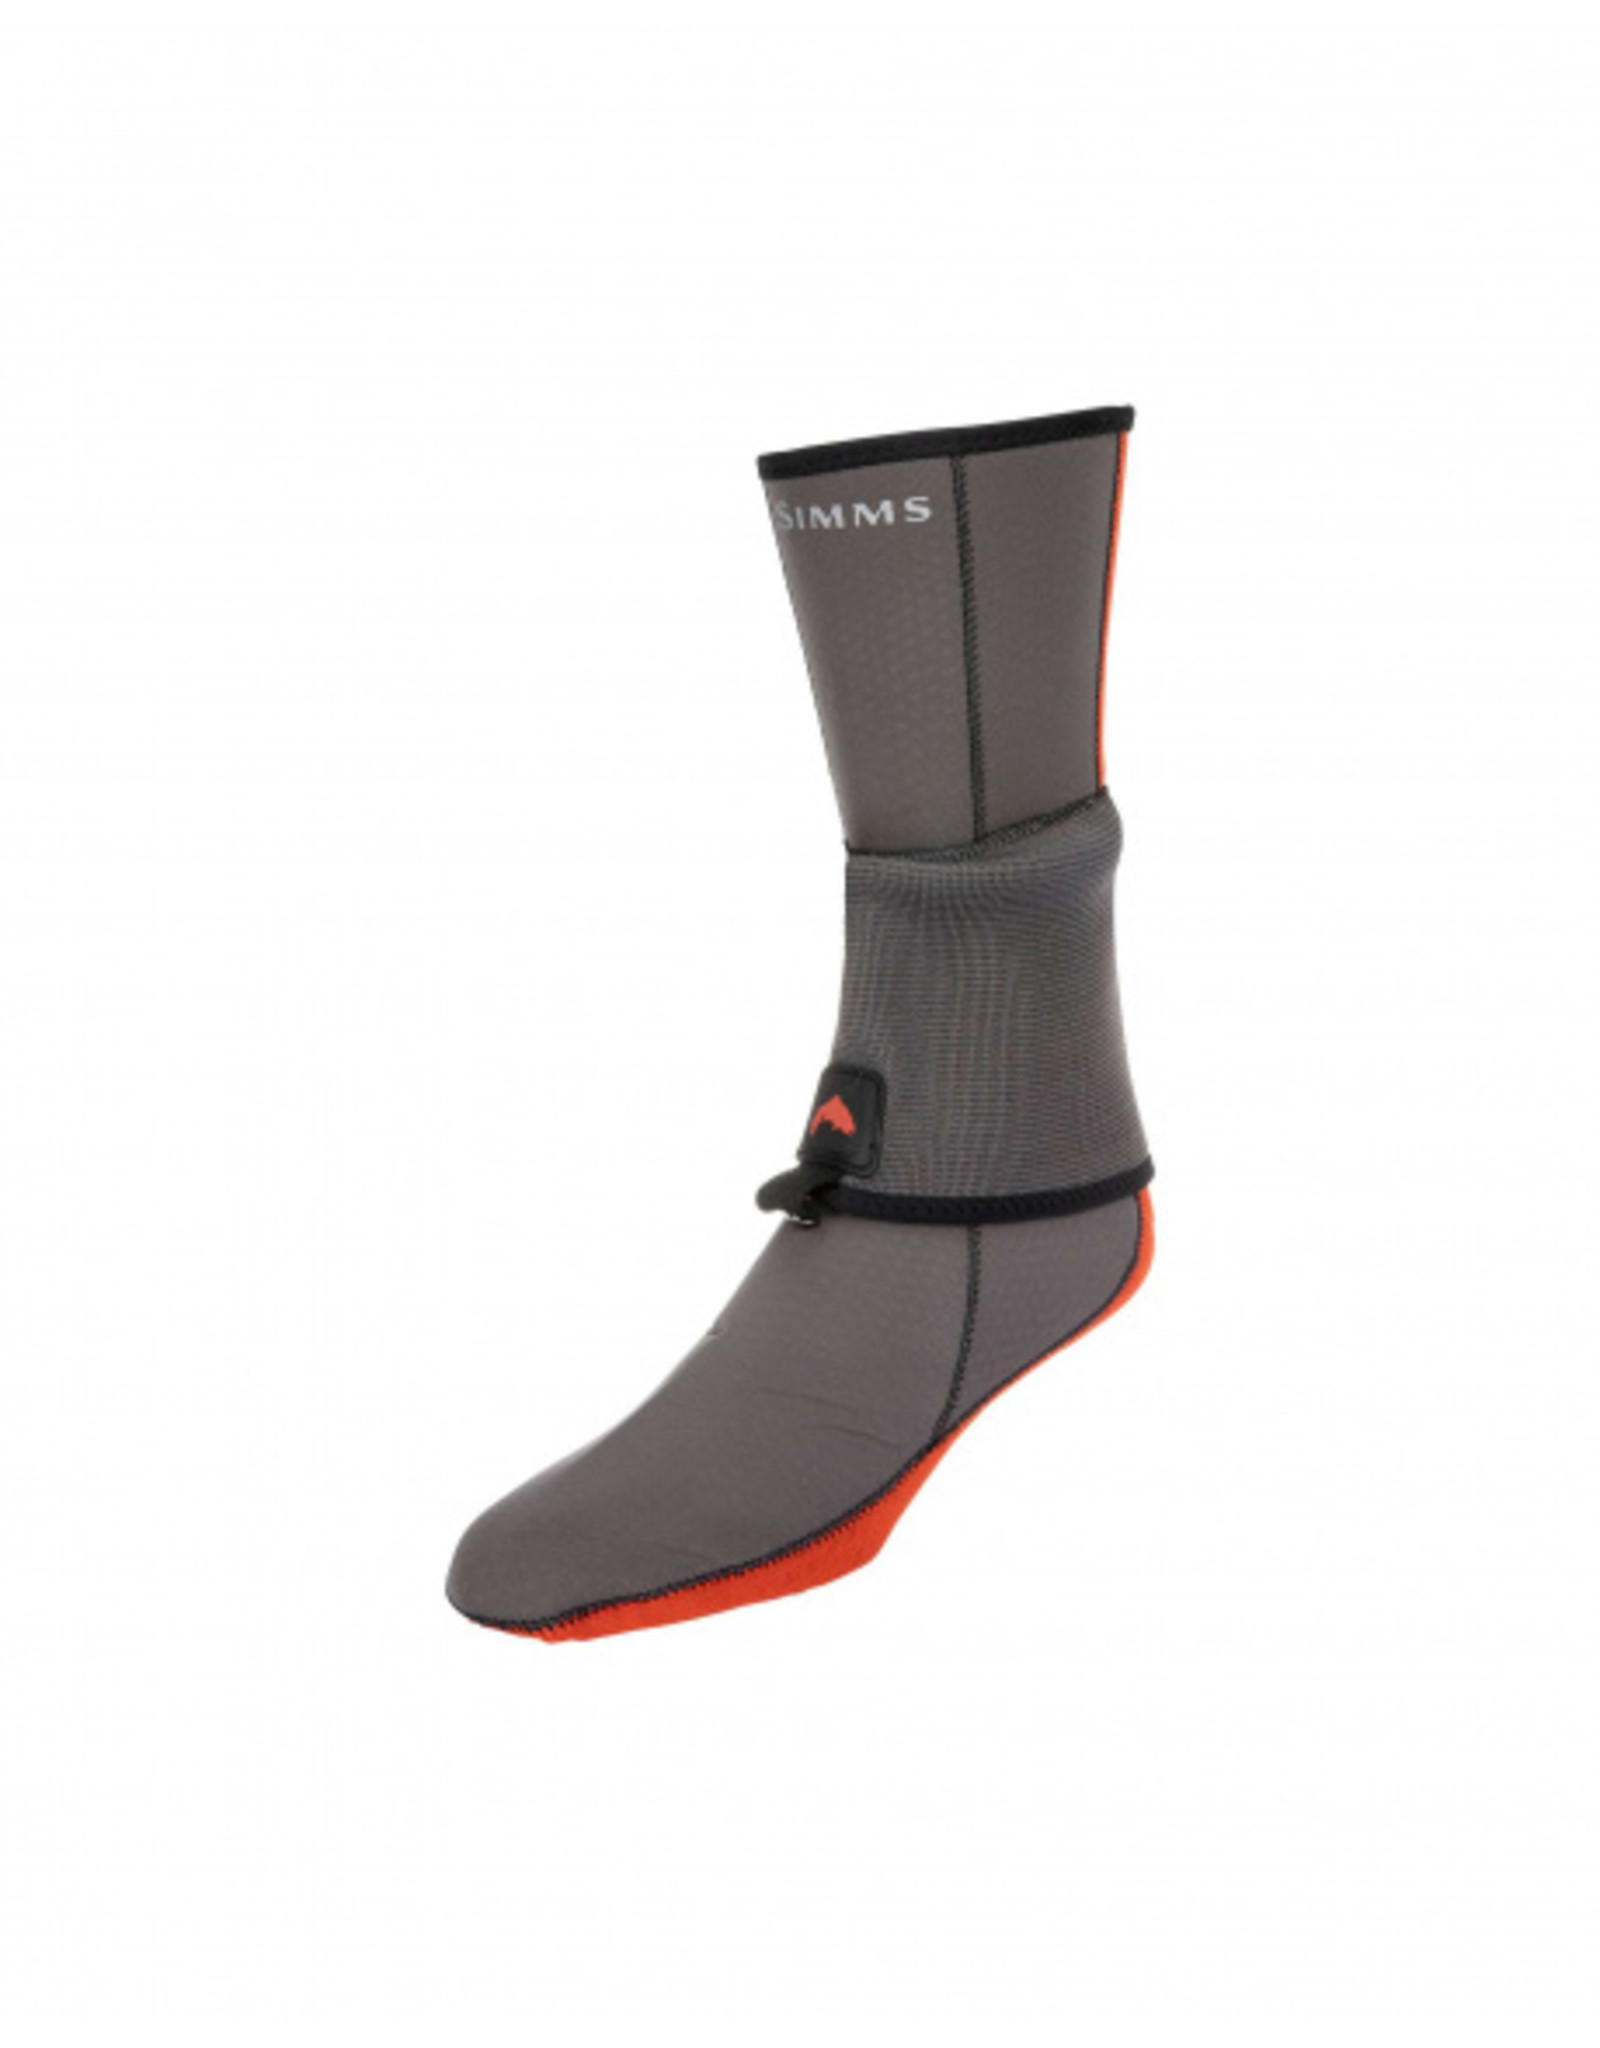 Simms Simms - M's Flyweight Neoprene Wet Wading Socks